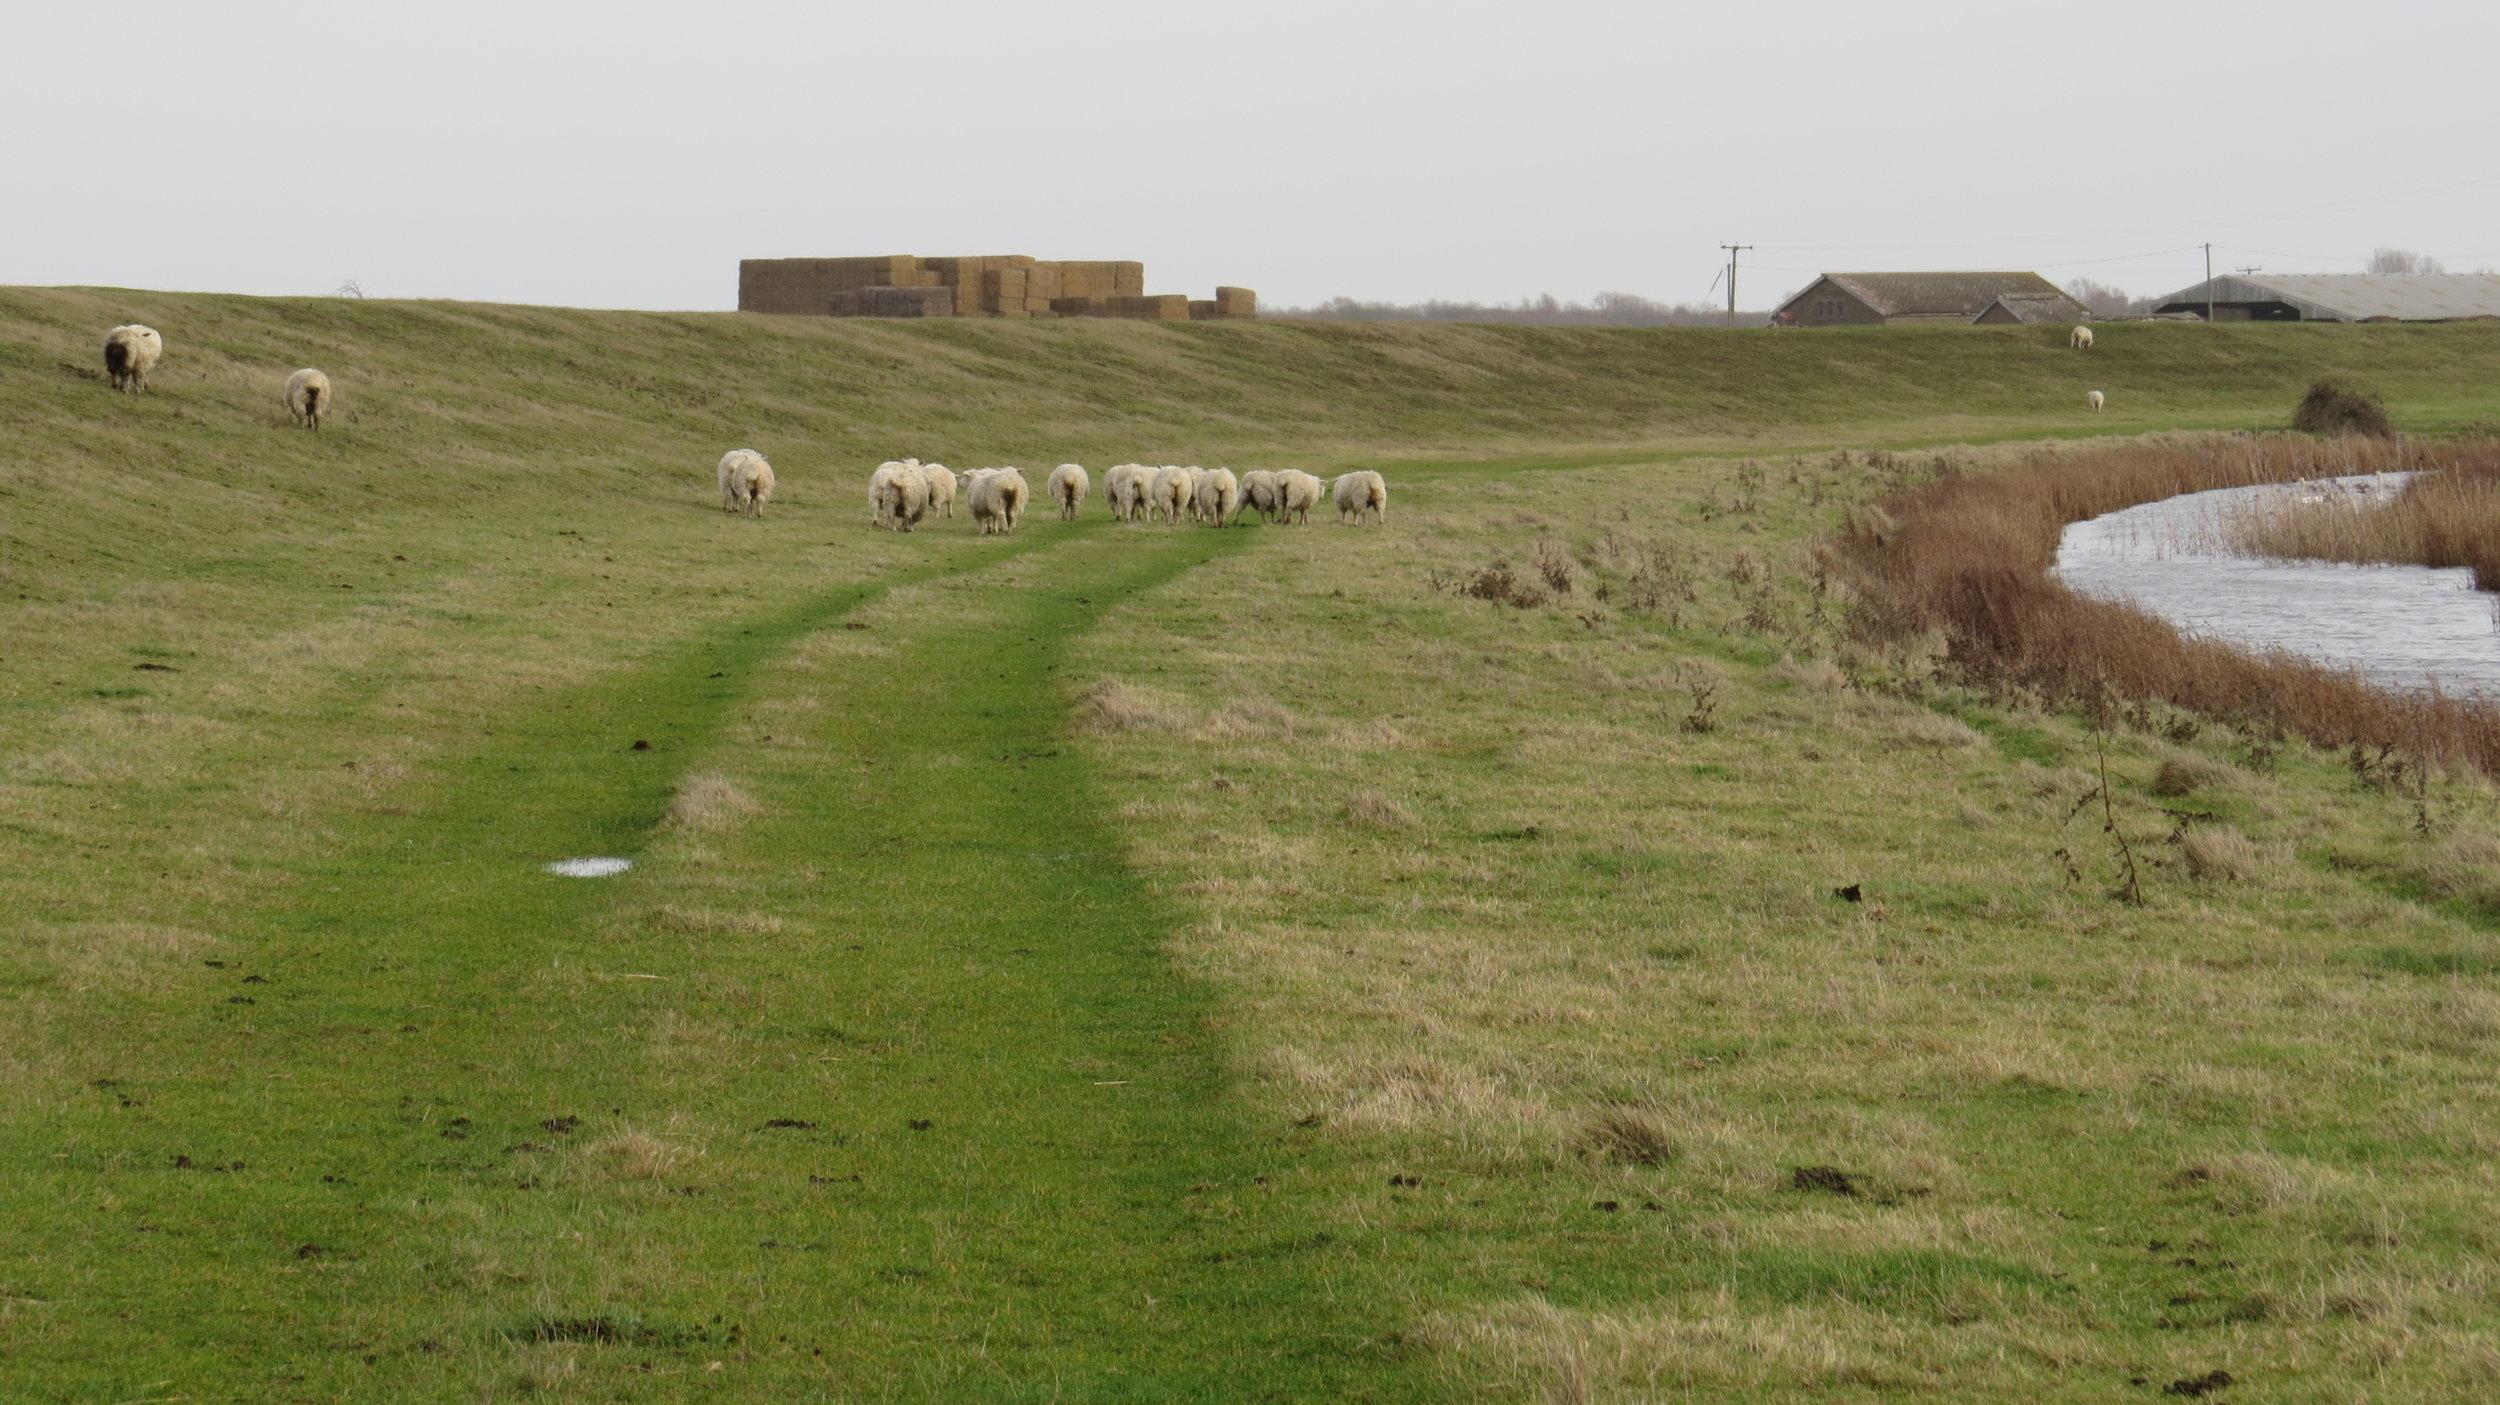 Accidentally herding sheep